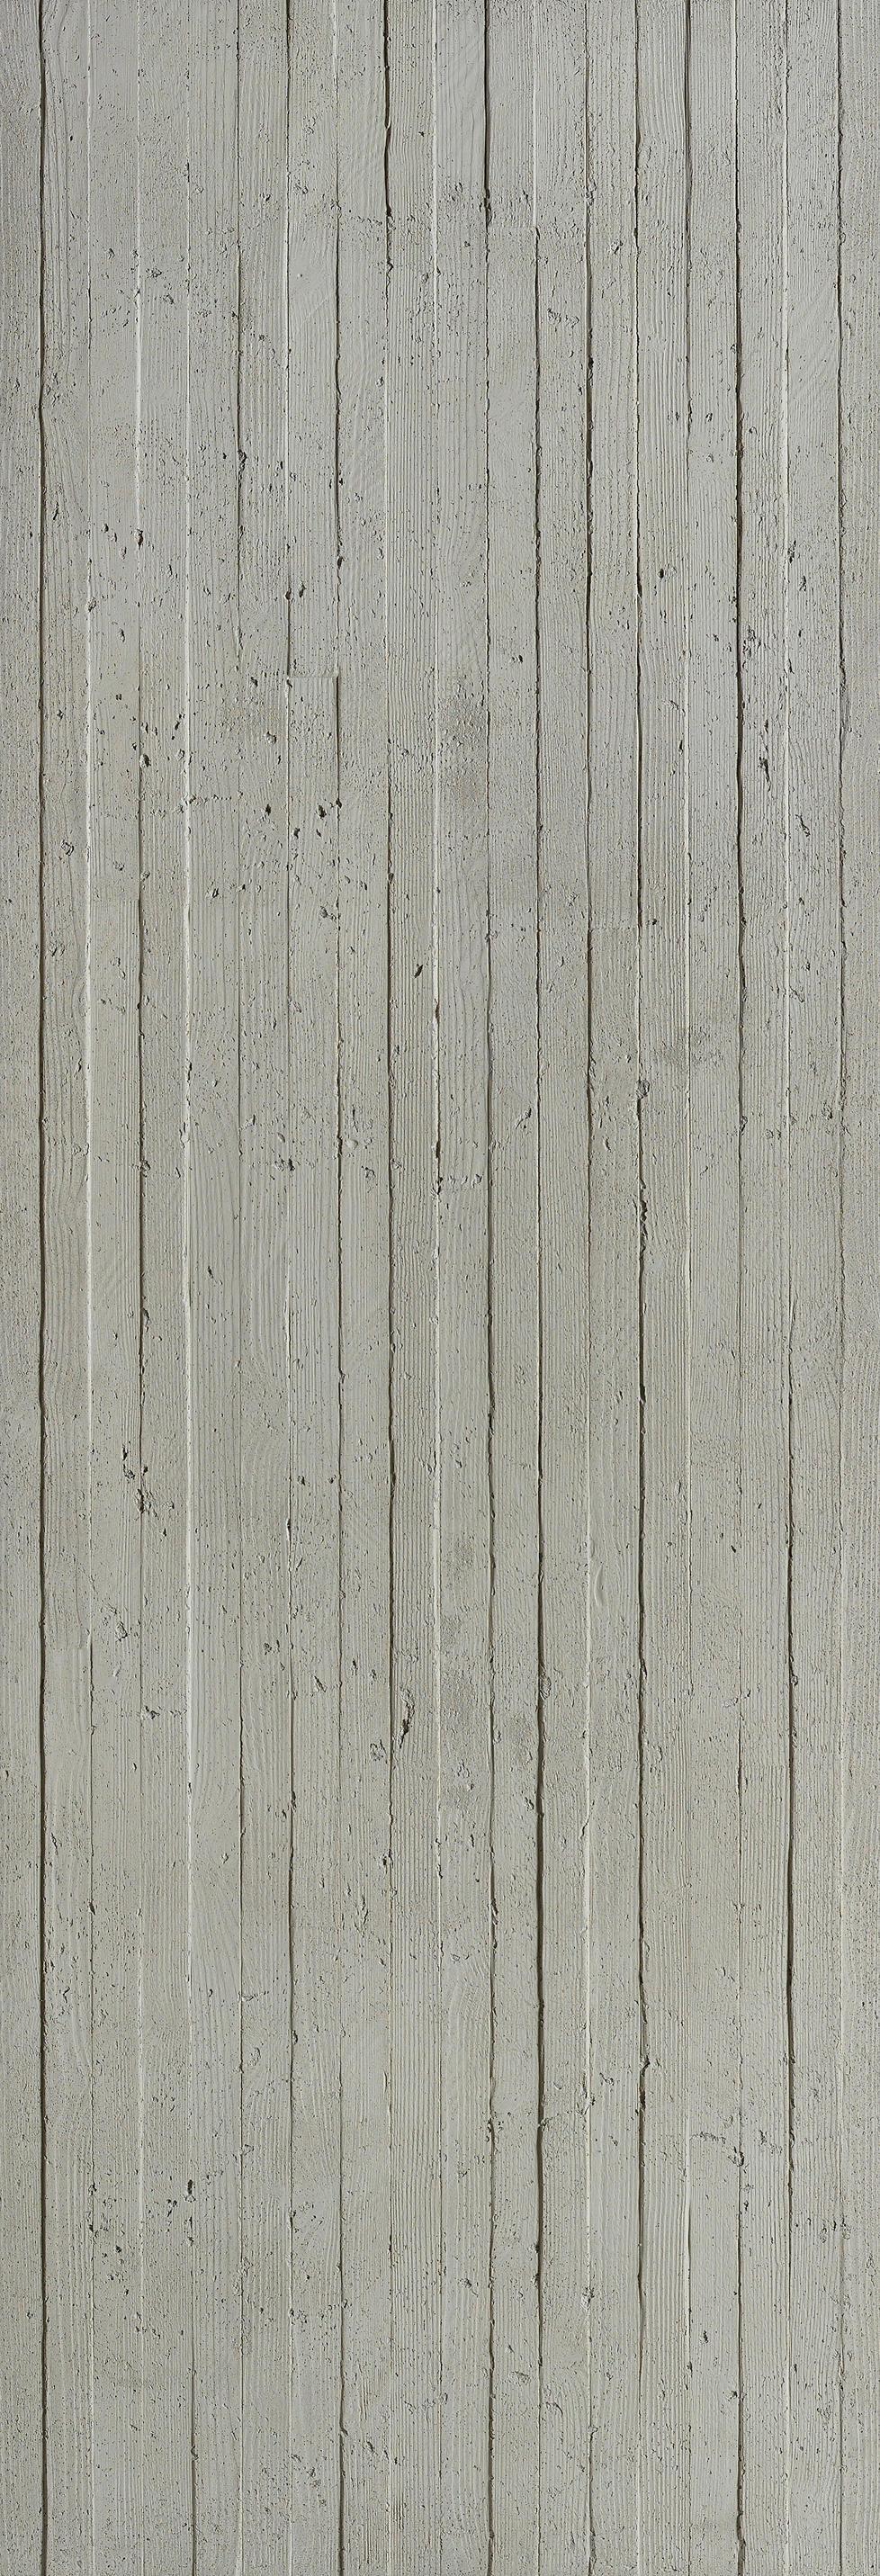 PANBETON® VERTICAL PLANKS - Beton Platten von Concrete LCDA | Architonic